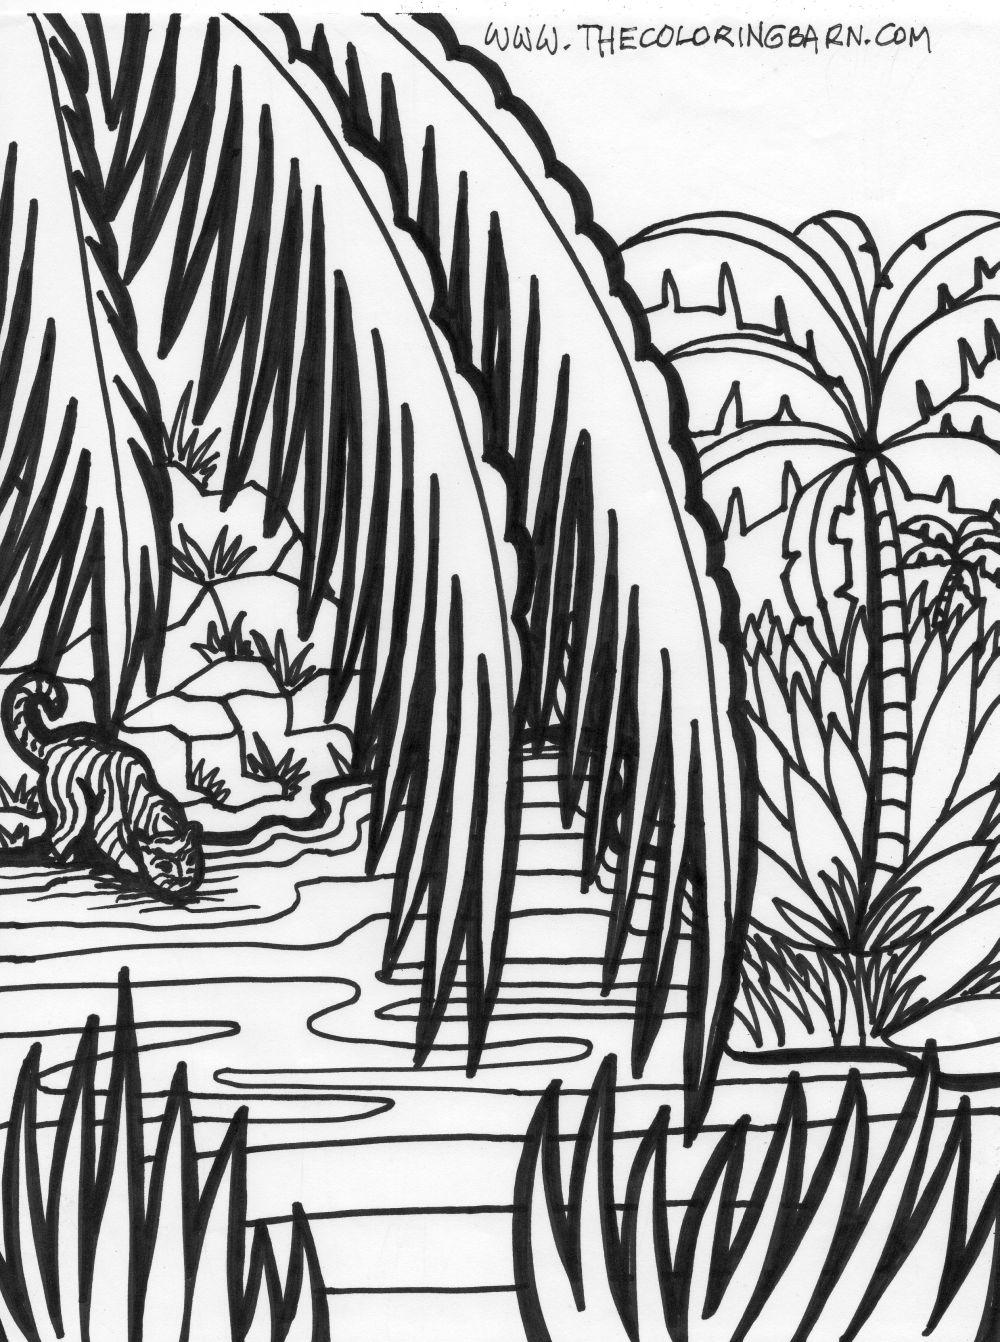 Drawn rainforest jungle scenery Coloring Jungle Rainforest Coloring Scene